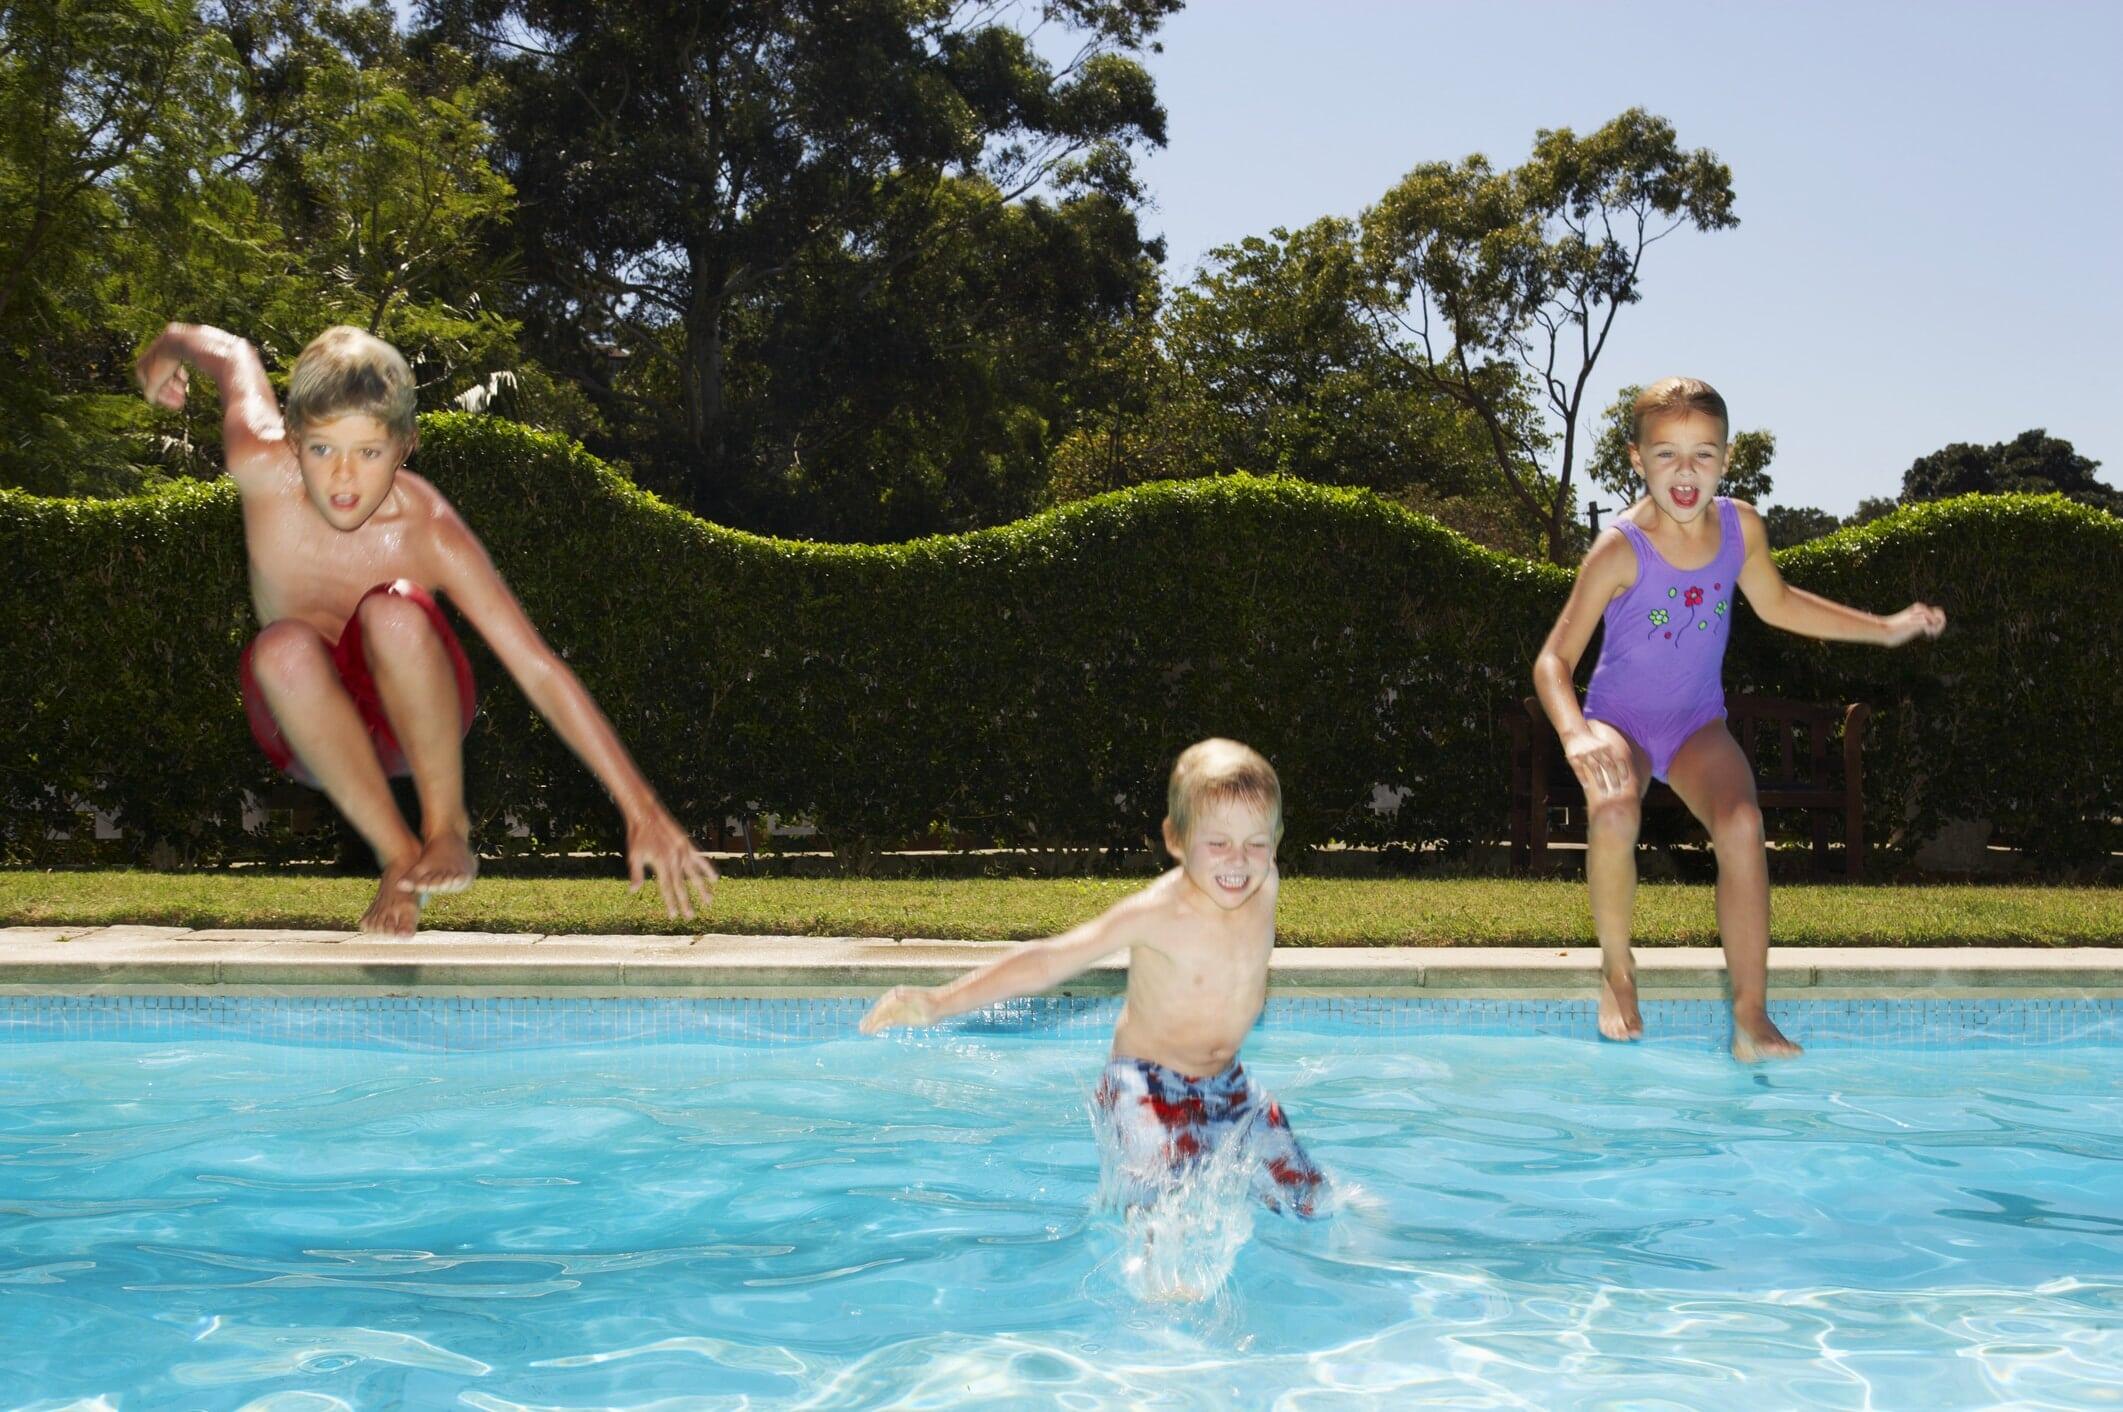 Paradise Pools and Spas of Illinois, Inc. image 6